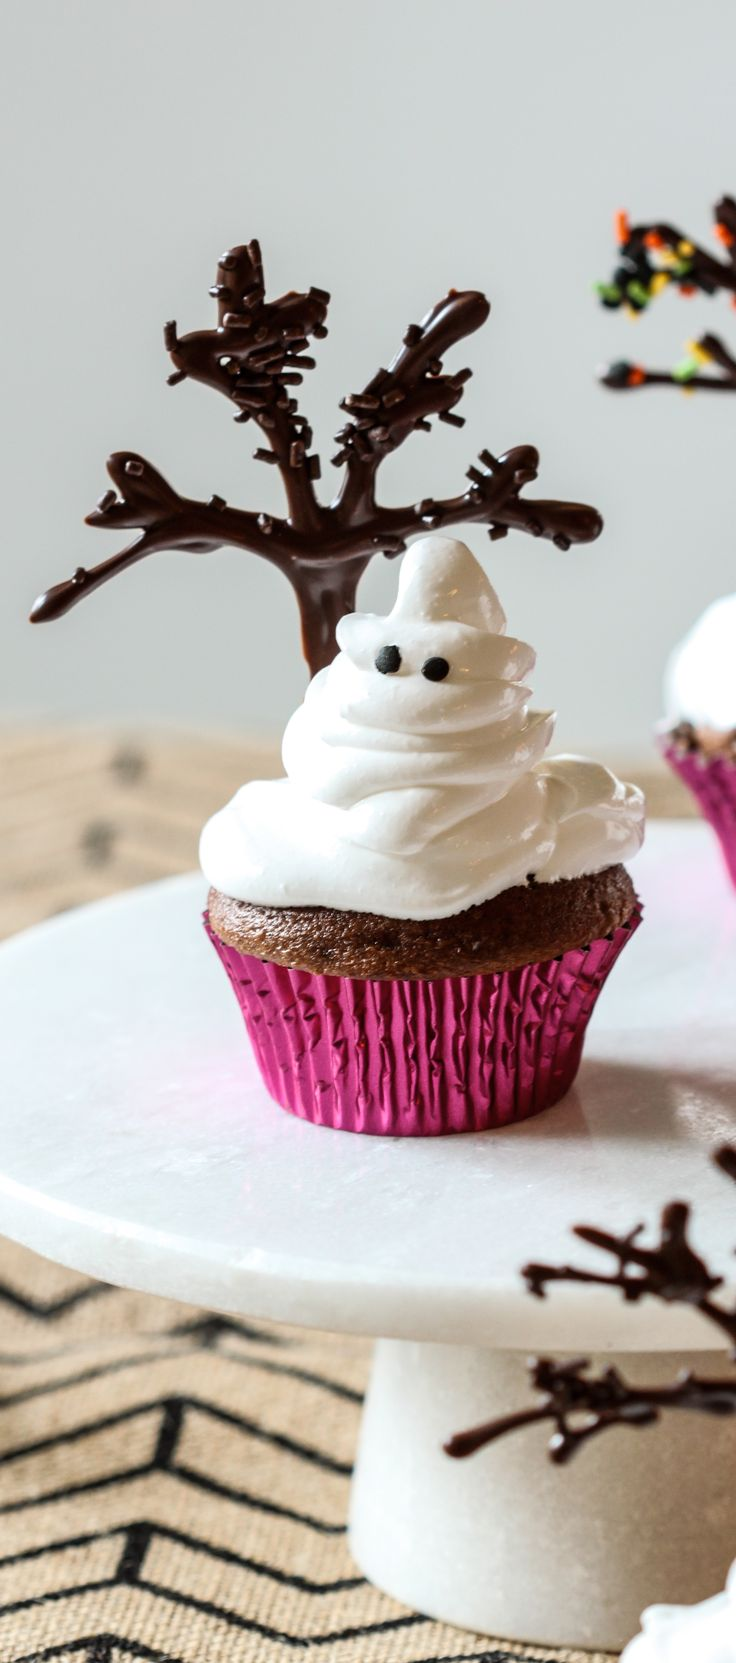 Ghost Cupcakes #halloweencupcakes http://www.aftershocksinteriordecorating.com